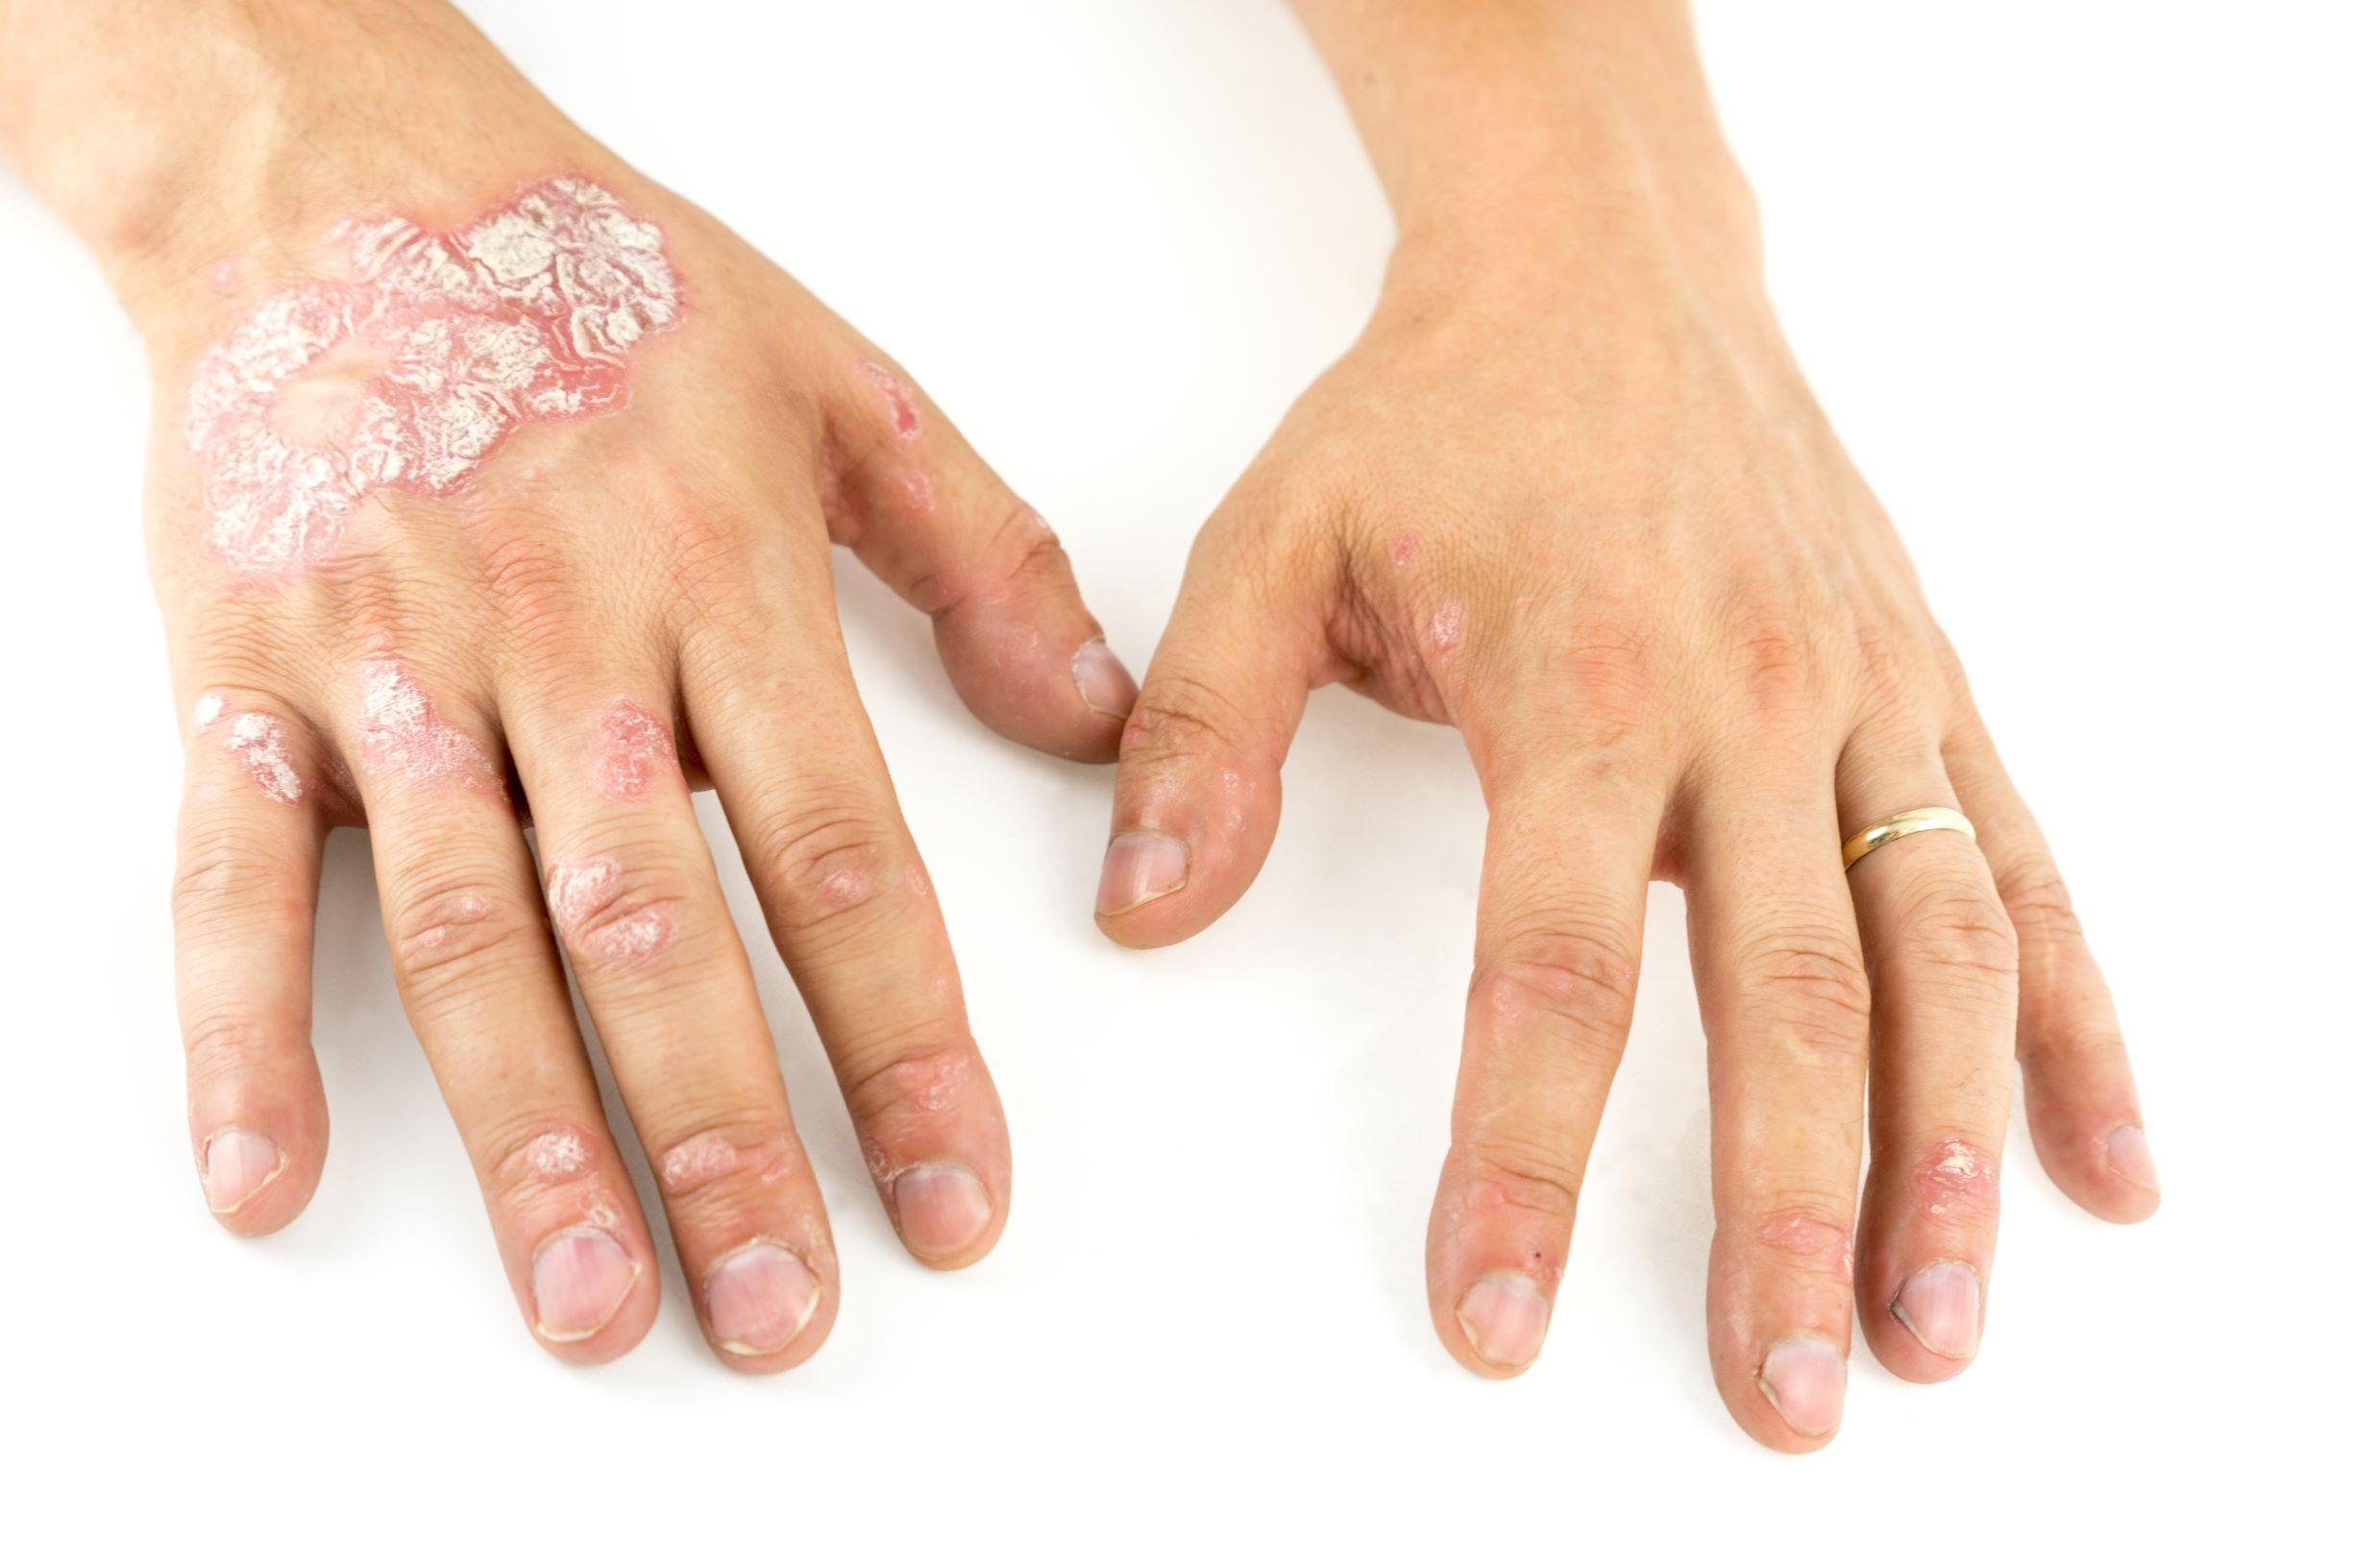 Psoriasi alle mani: i rimedi e le cure